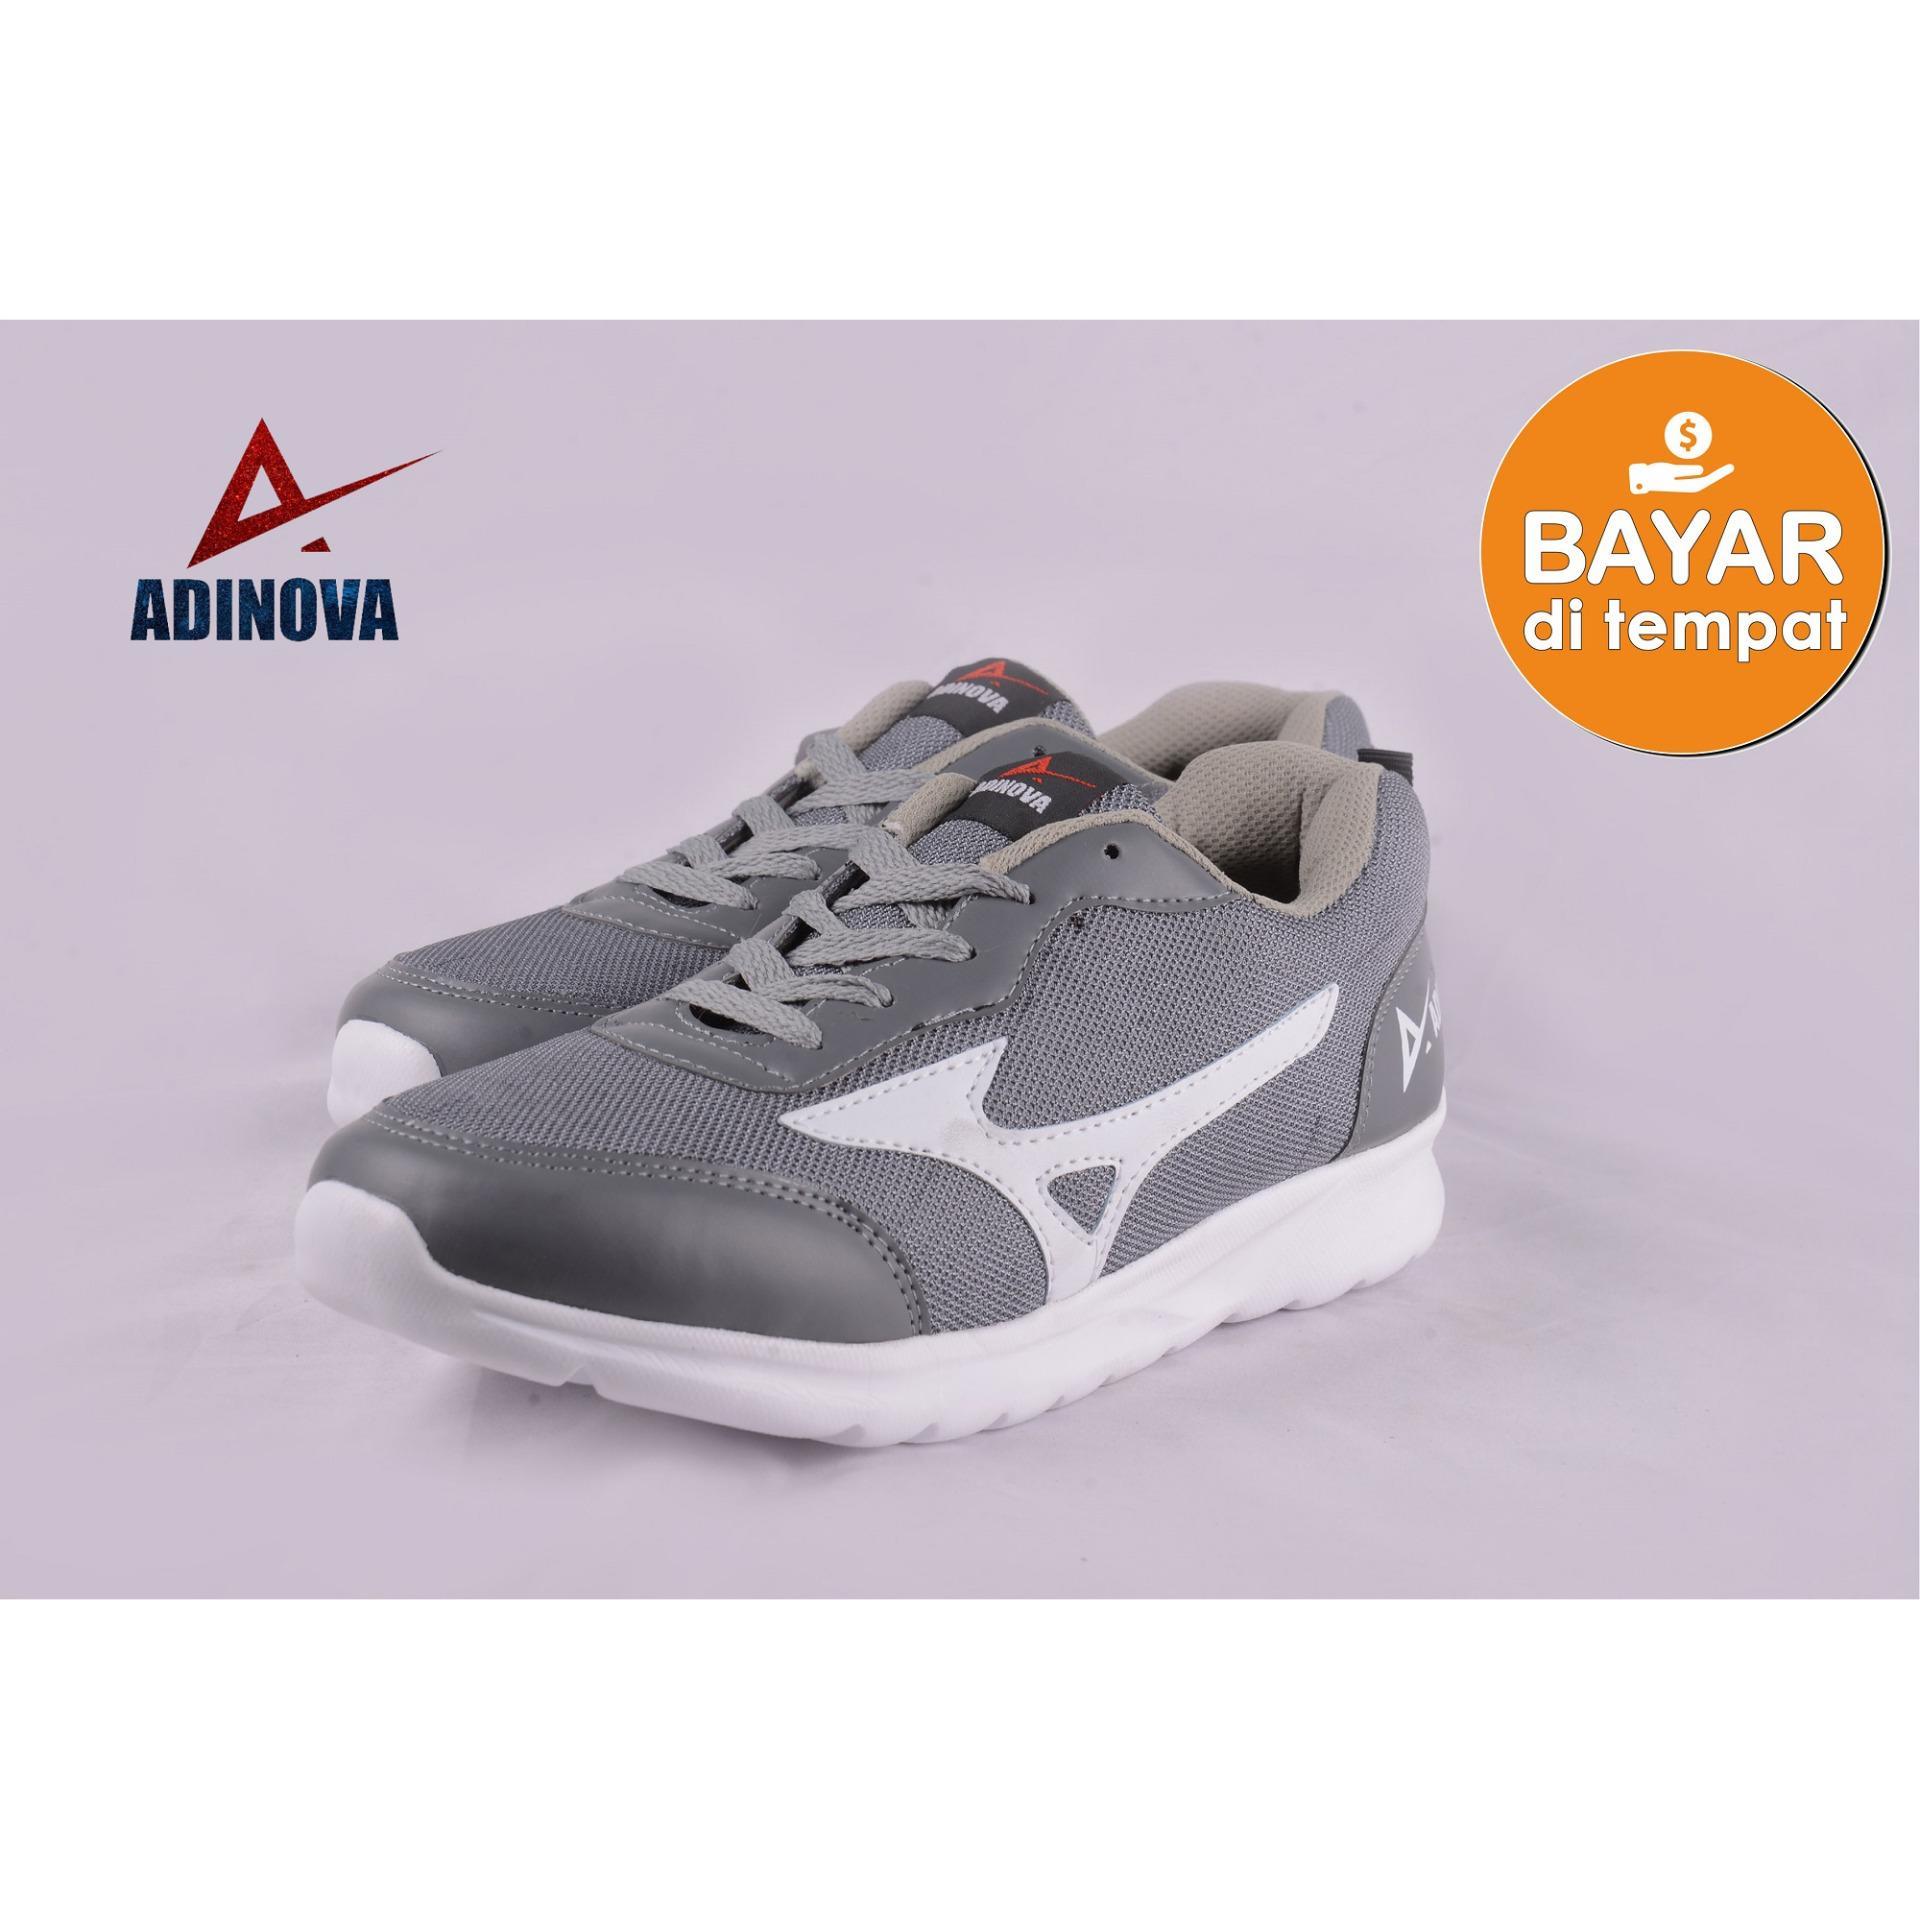 Adinova Shoes Sepatu Sport Pria Aguero  Sepatu Sneaker Pria   Sepatu  Olahraga Sepatu Lari f19aa718ee